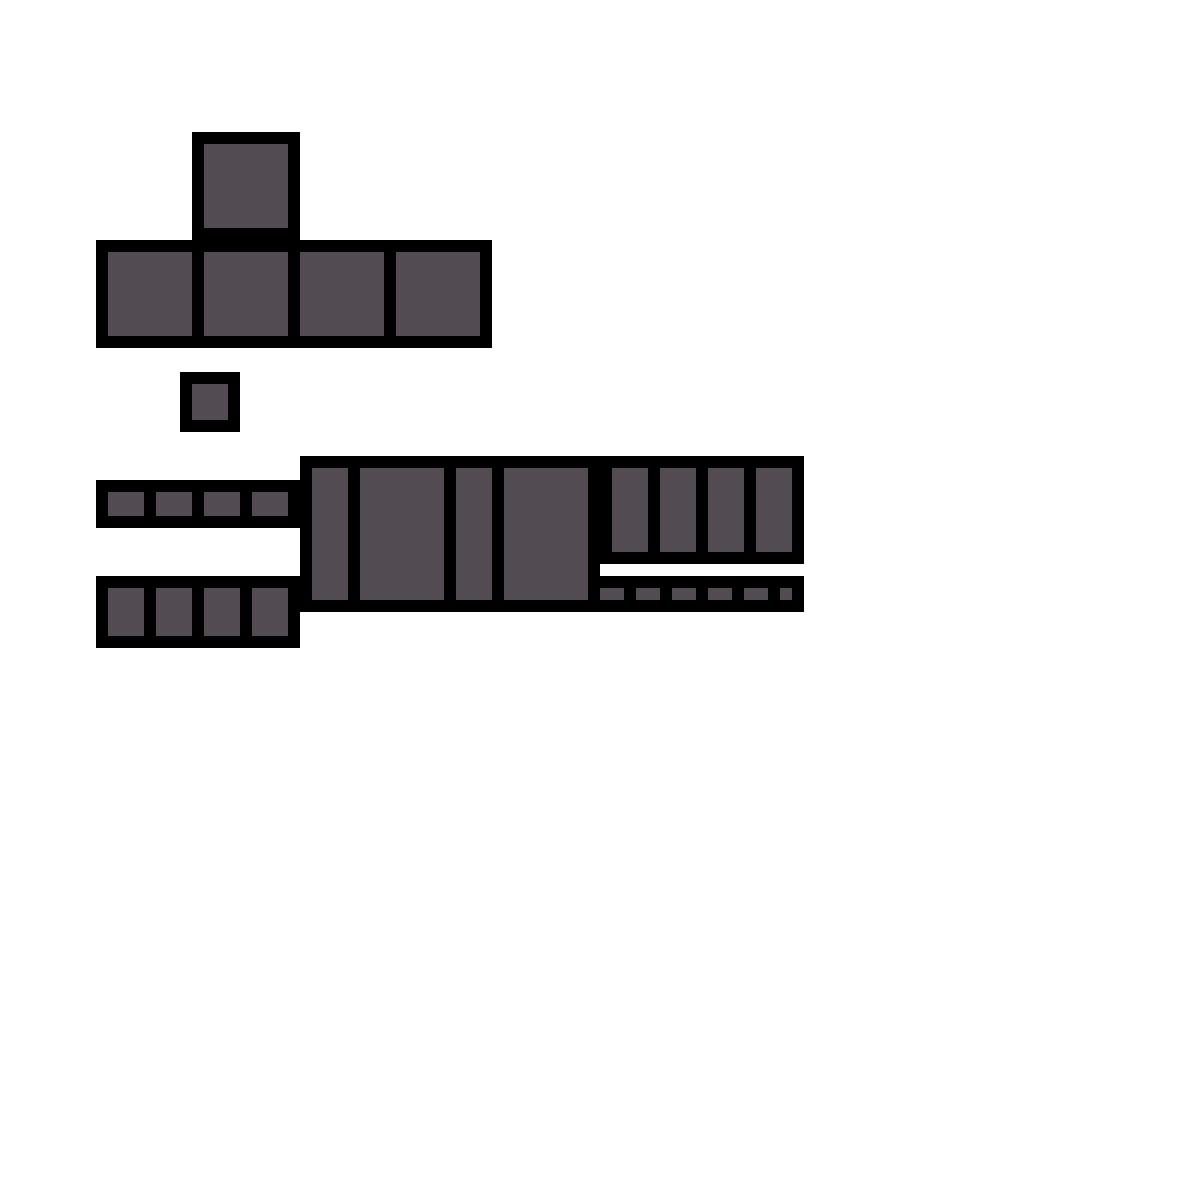 Minecraft Armor Blank Template